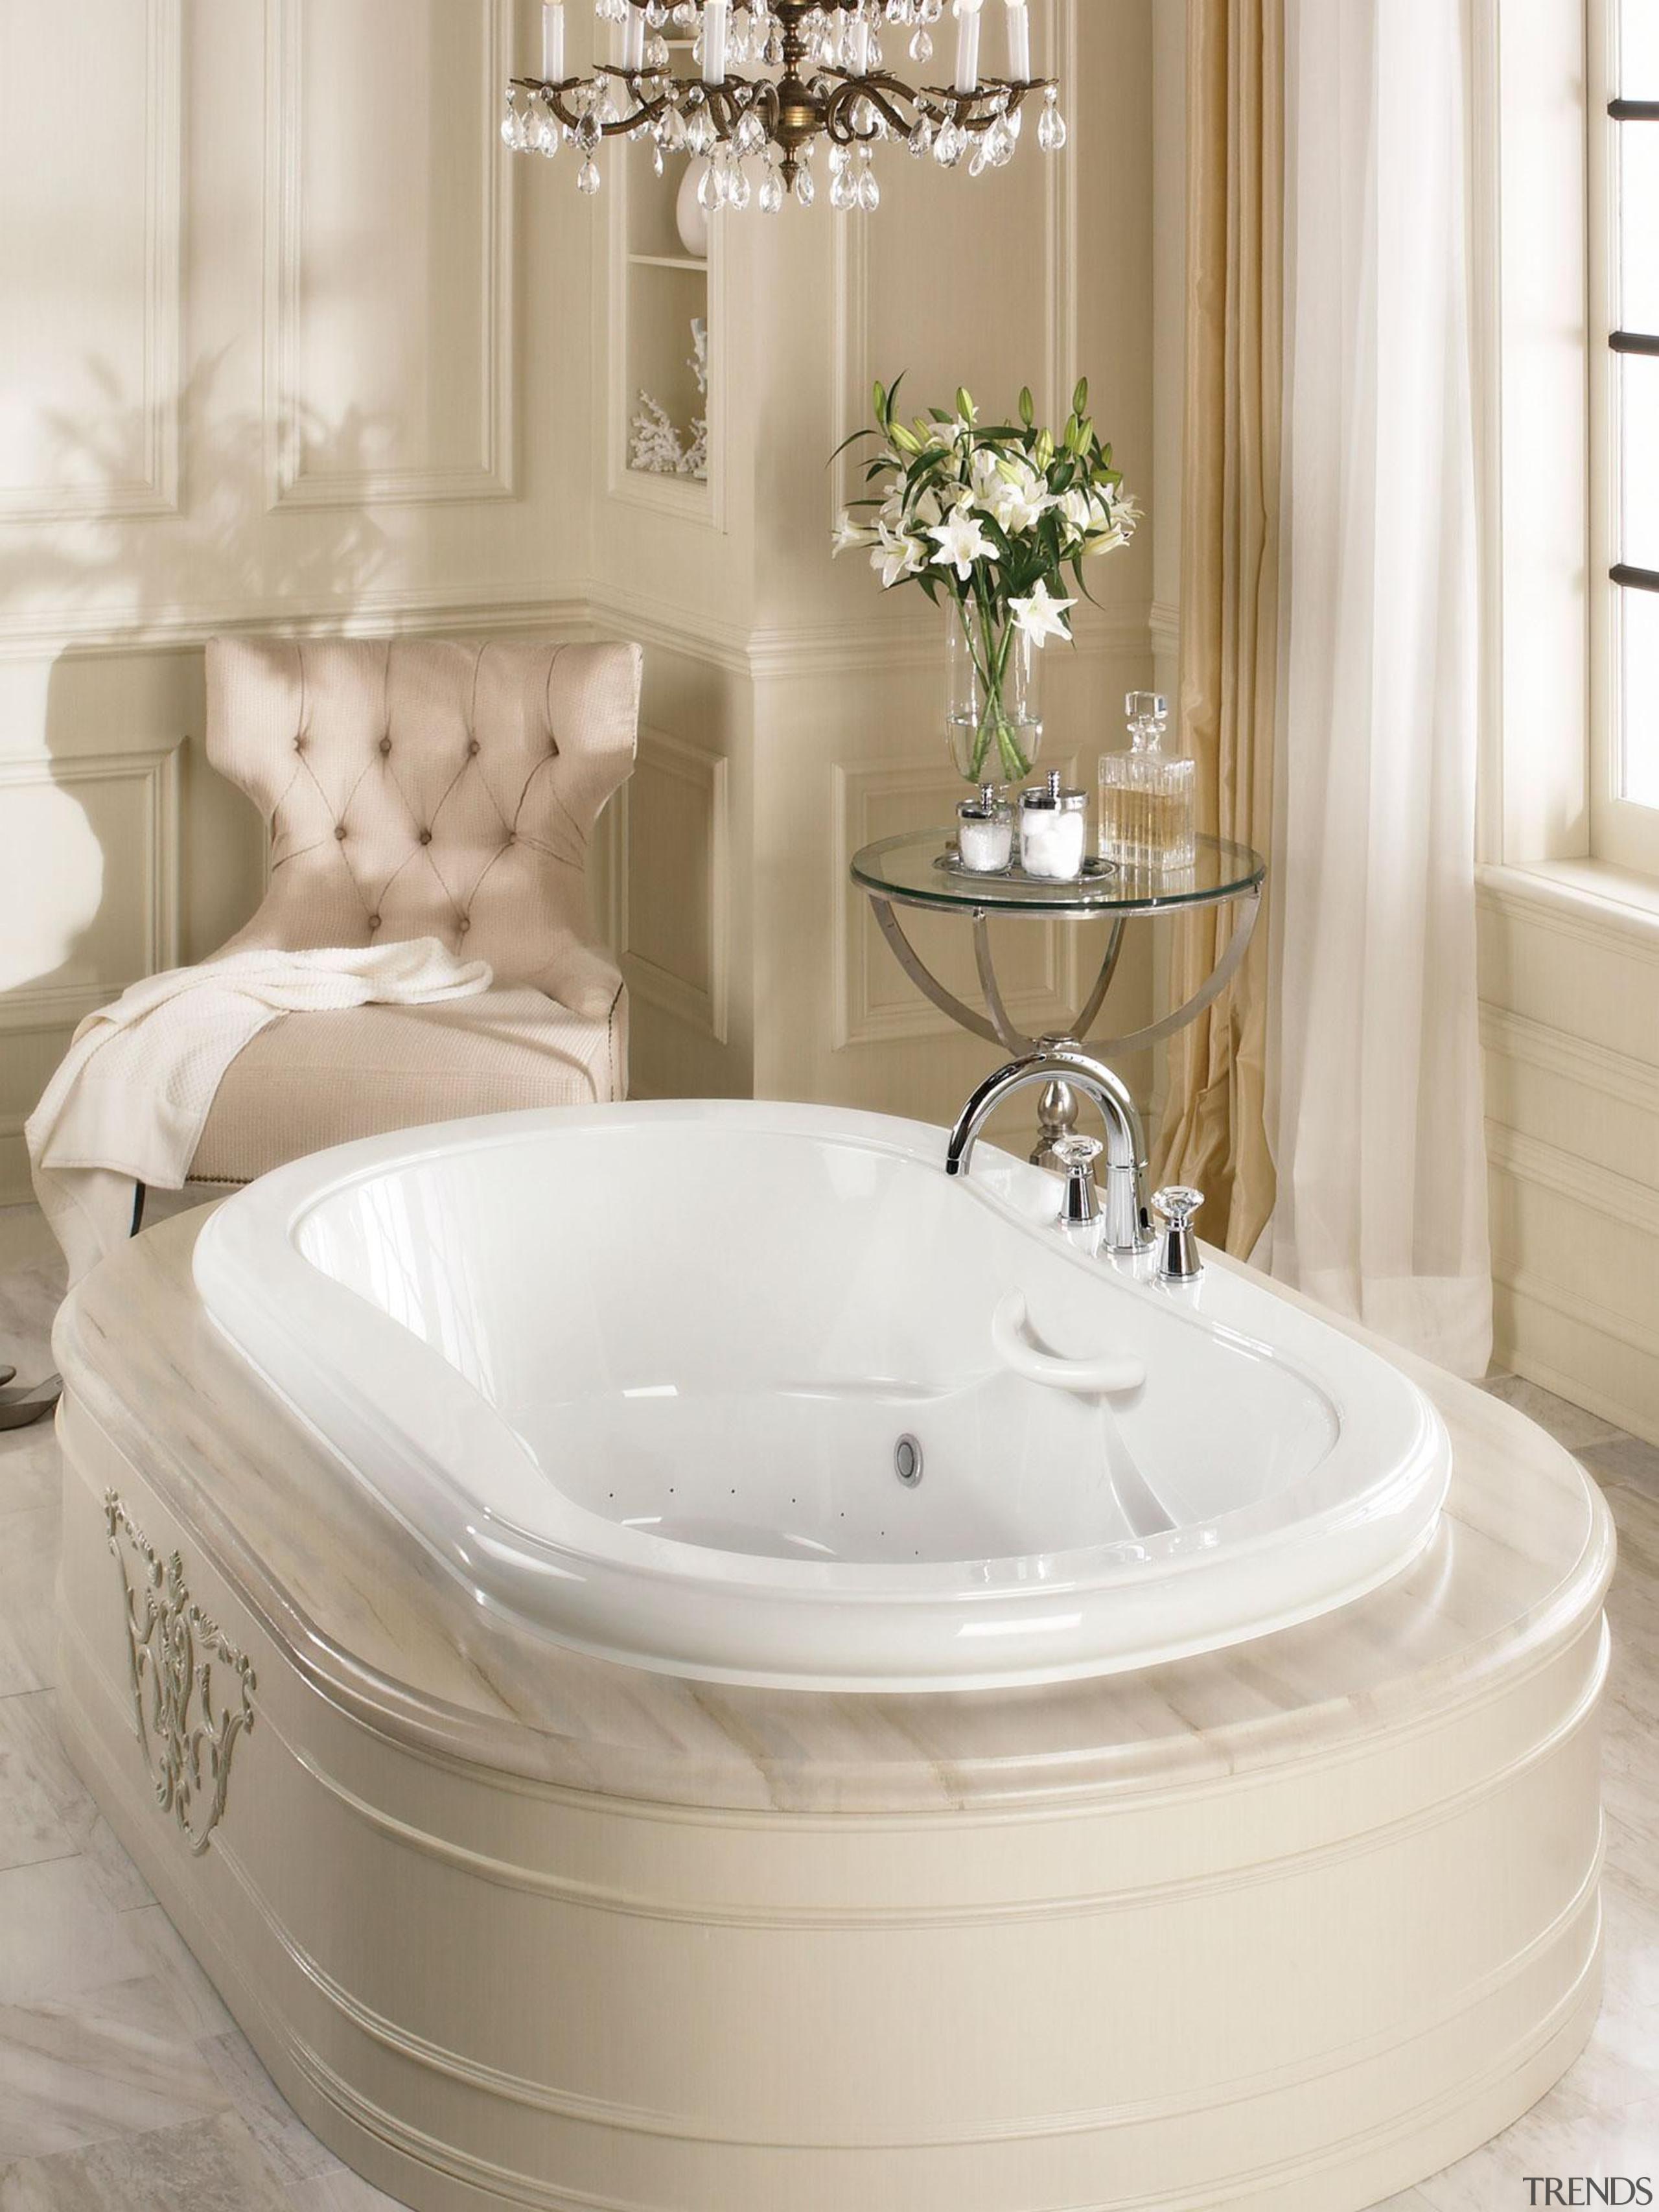 elegancia-c11.jpg - elegancia-c11.jpg - bathroom | bathroom sink bathroom, bathroom sink, bathtub, ceramic, furniture, plumbing fixture, product, product design, sink, tap, toilet seat, white